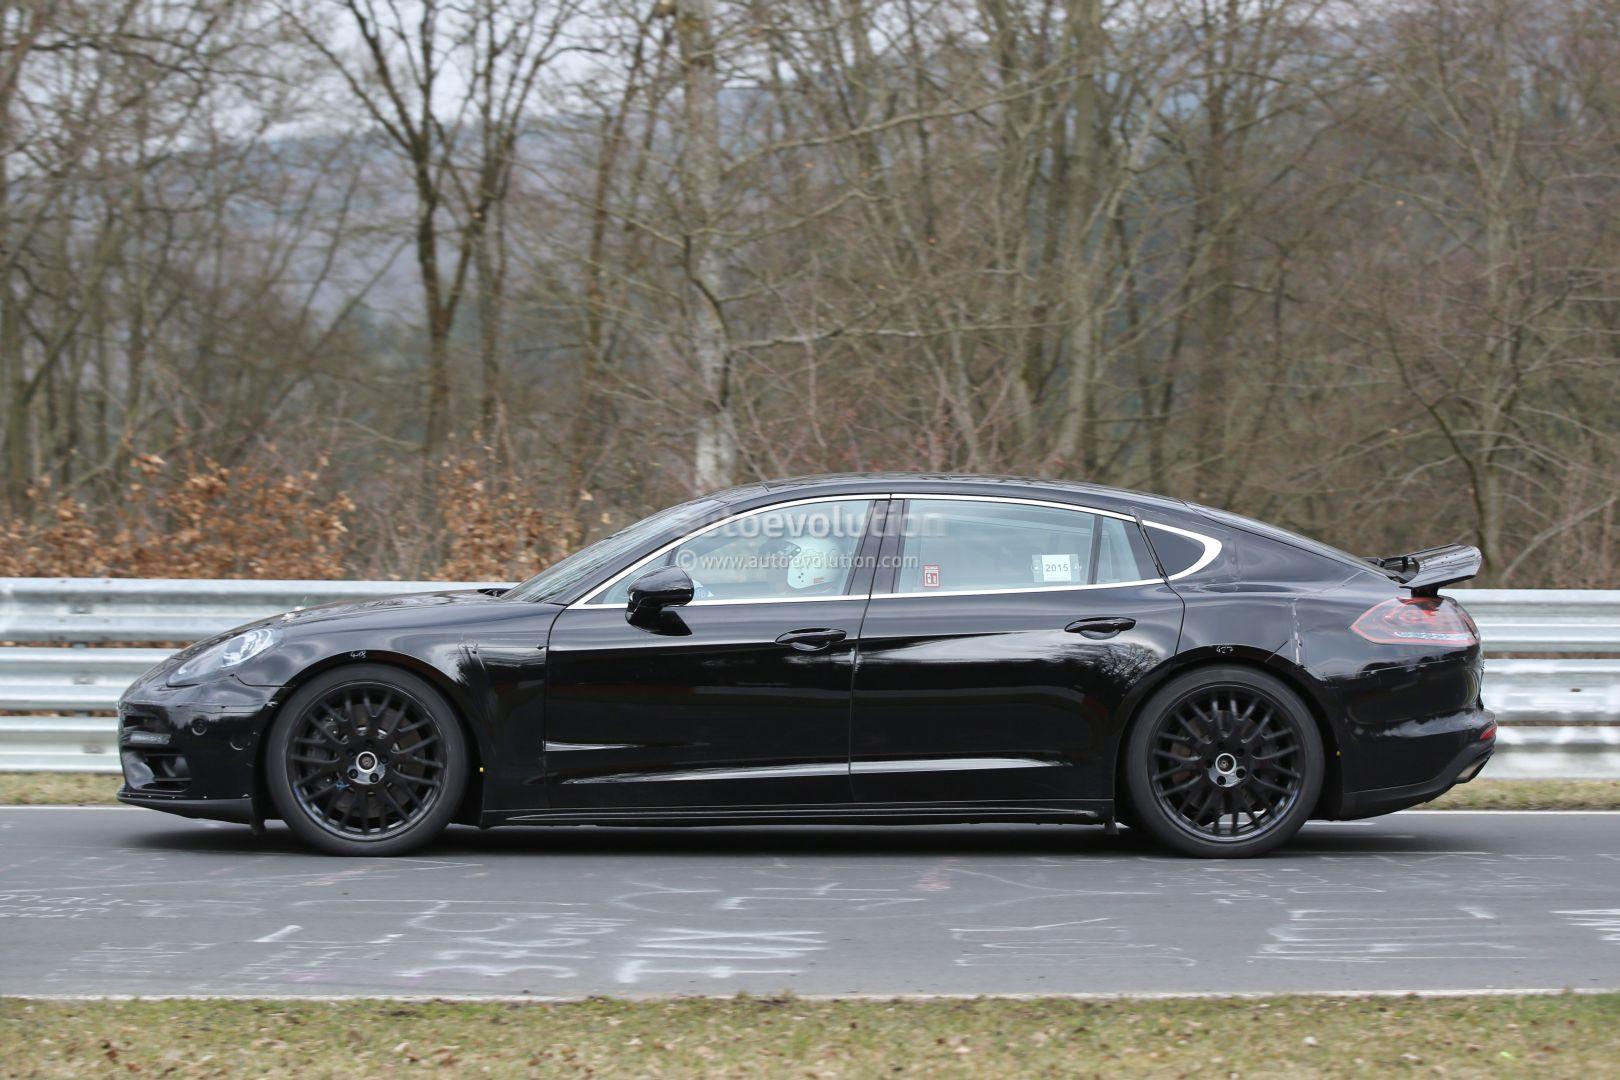 Porsche Driving Experience >> 2017 Panamera Executive Nurburgring Spyshots: How Porsche Plans to Reinvent the Panamera ...